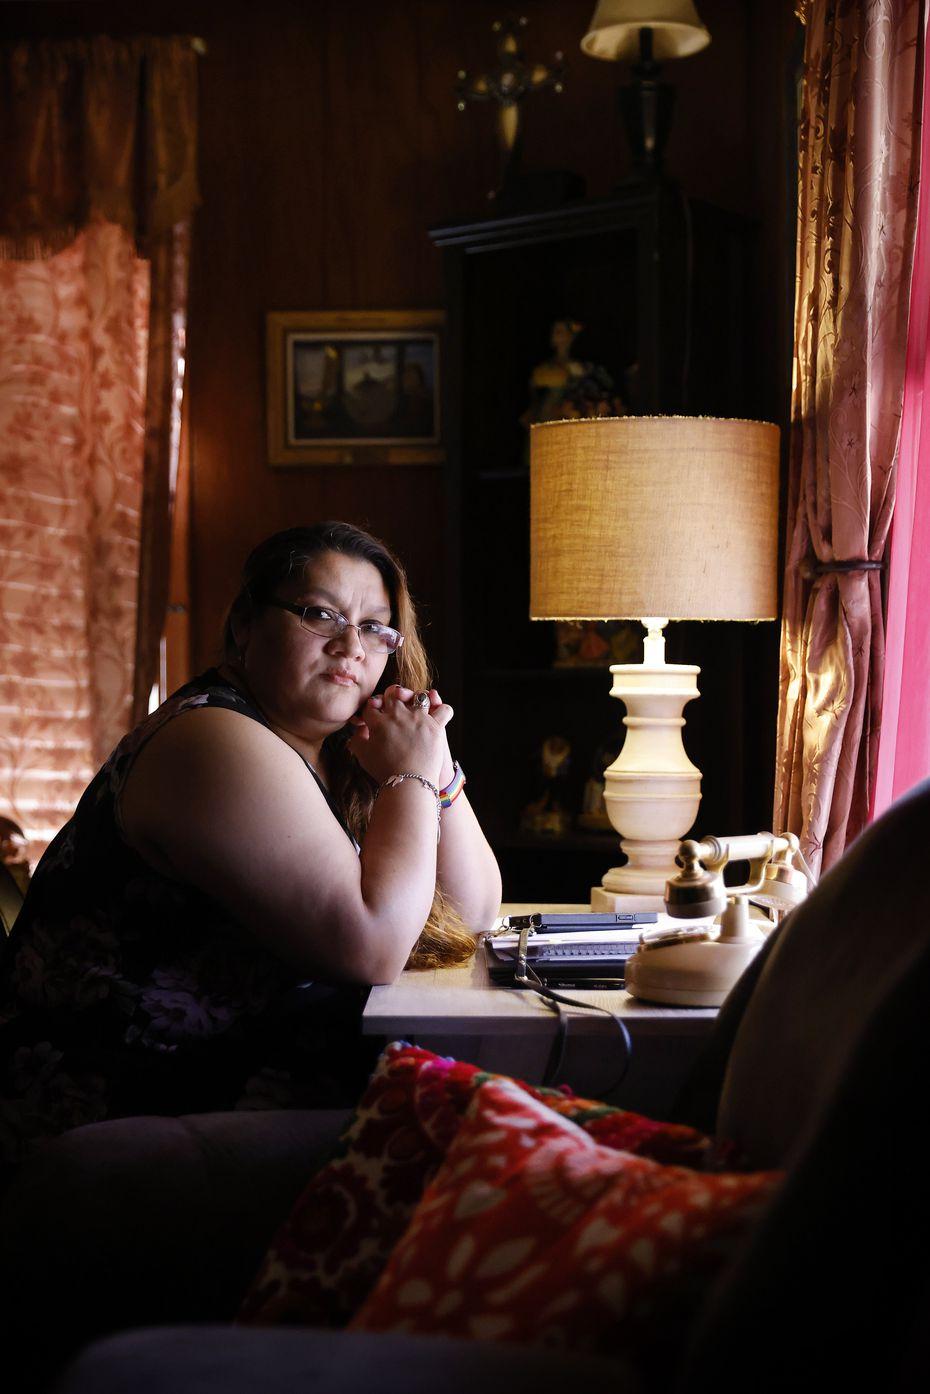 Mount Auburn resident Lisa Lopez, who lives on Wayne Street, has long been a schools and neighborhood advocate.